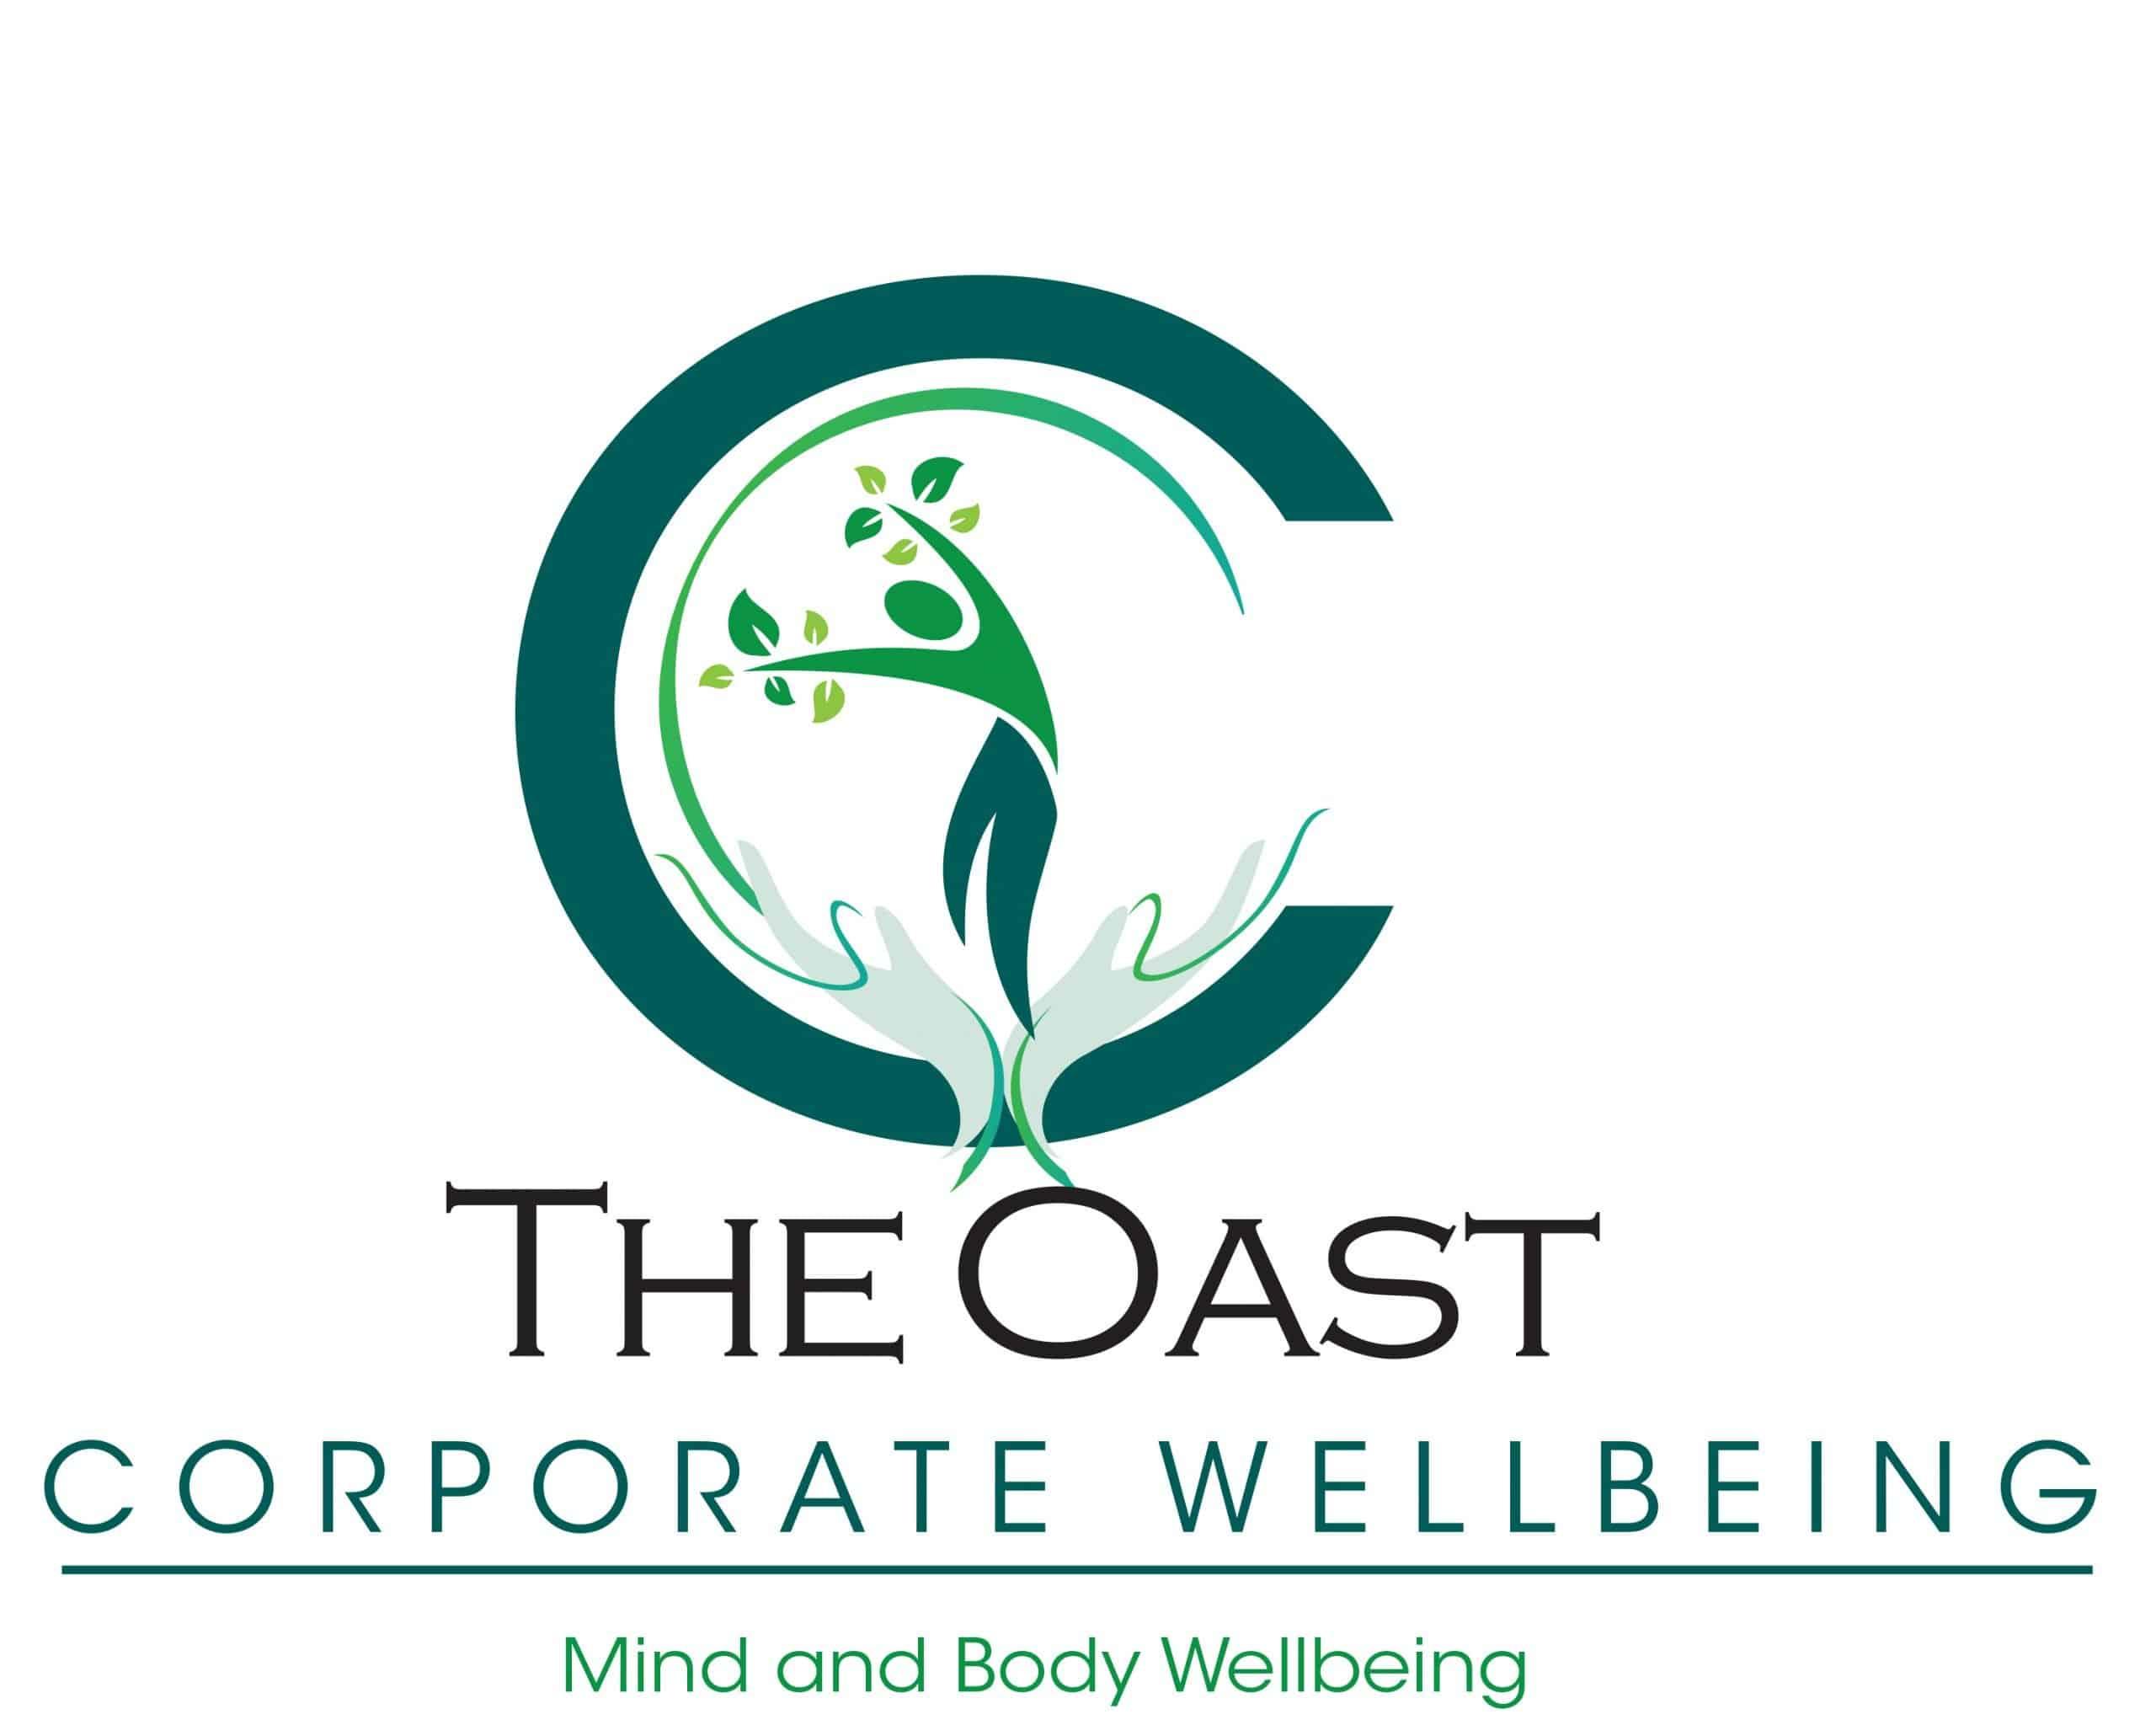 https://www.story22.co.uk/wp-content/uploads/2021/02/The-Oast-Corproate-wellbeing-FINAL-scaled.jpg